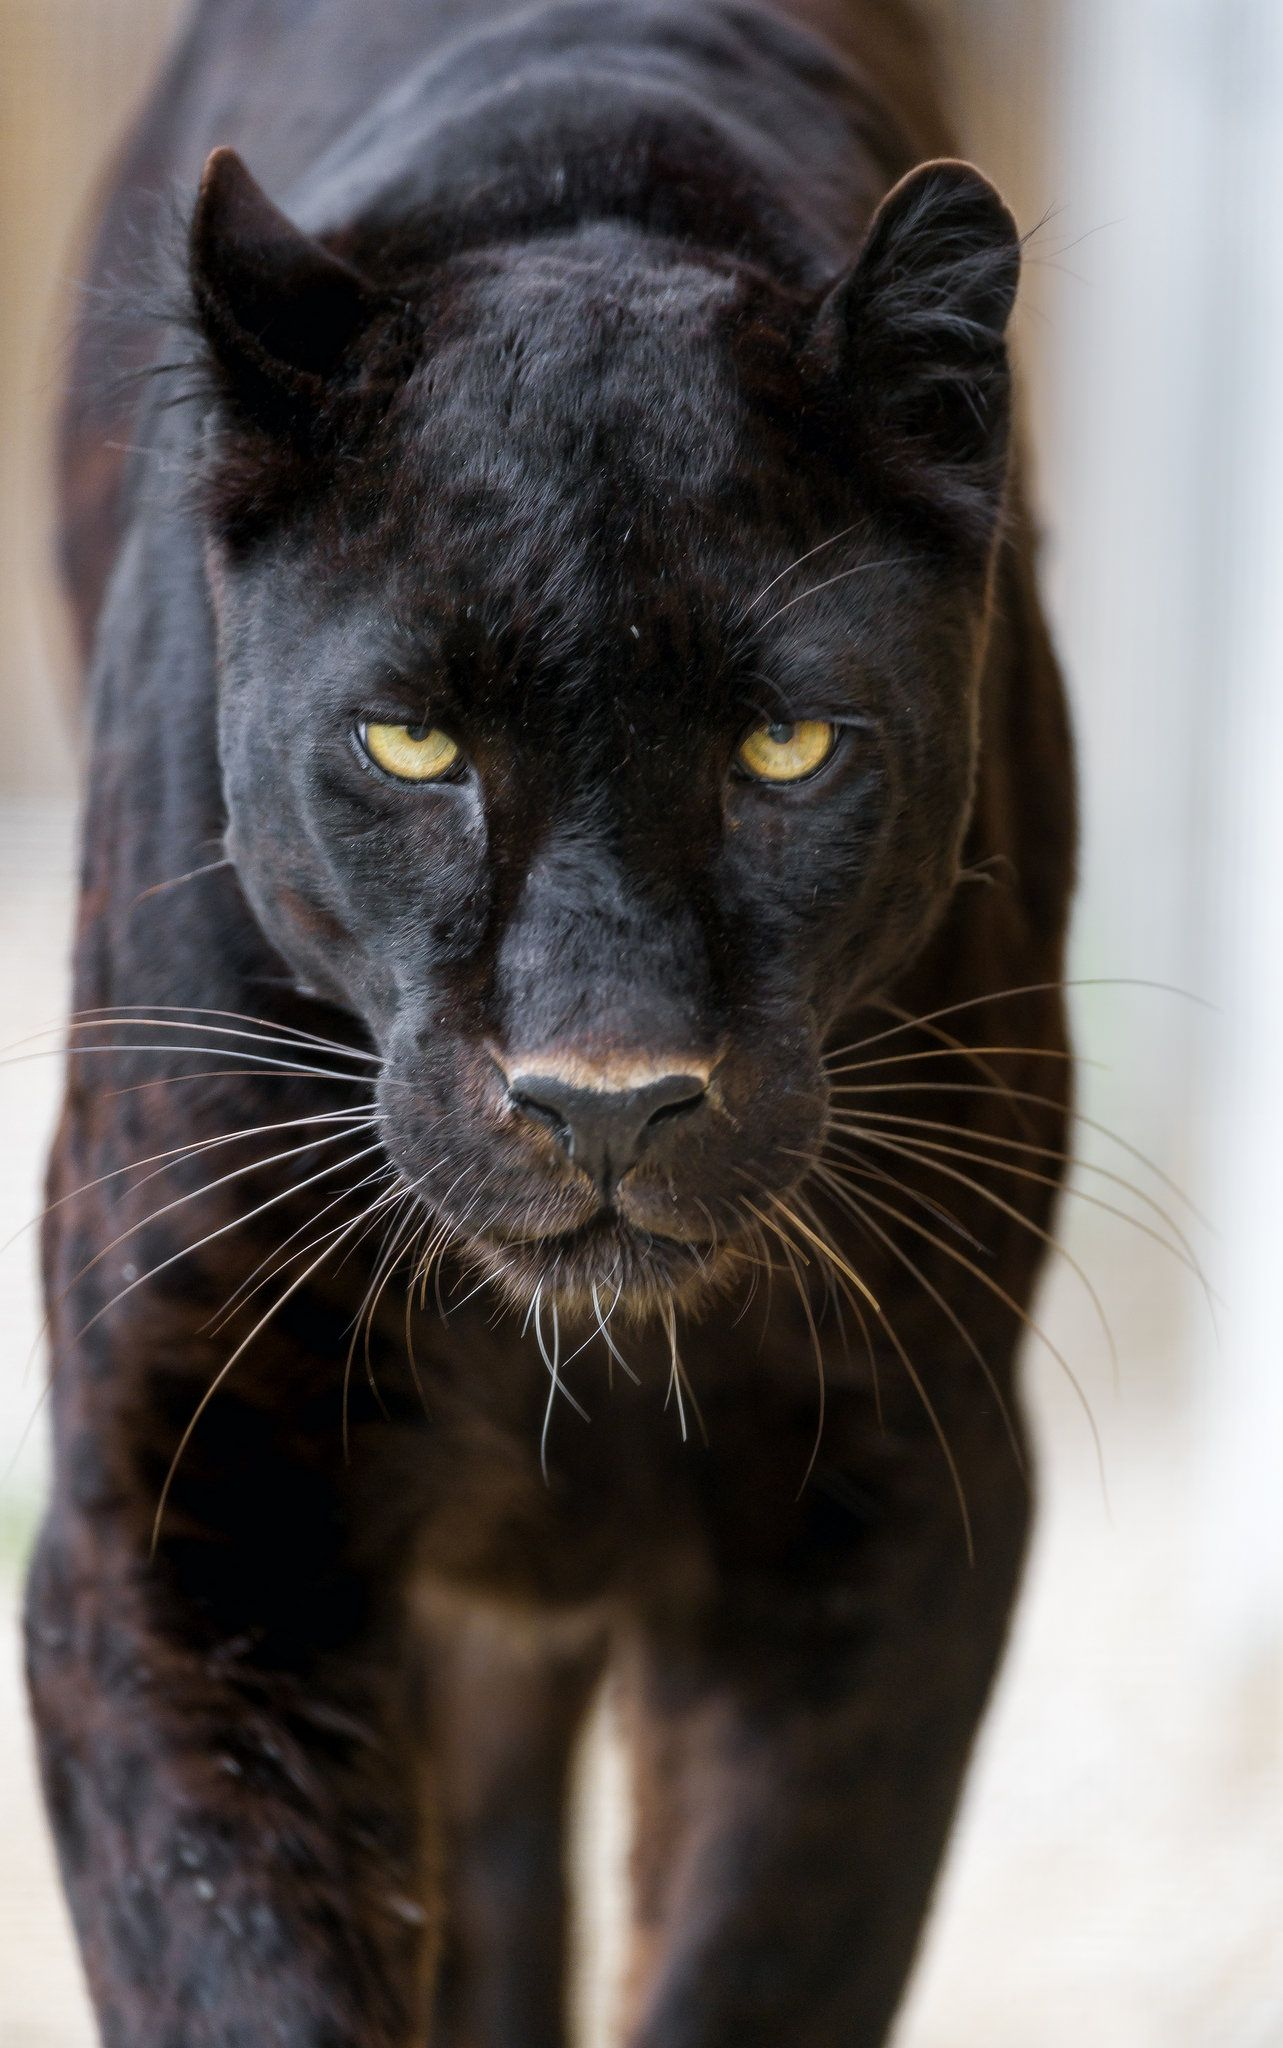 Blacky getting really close! Черная пантера, Черный